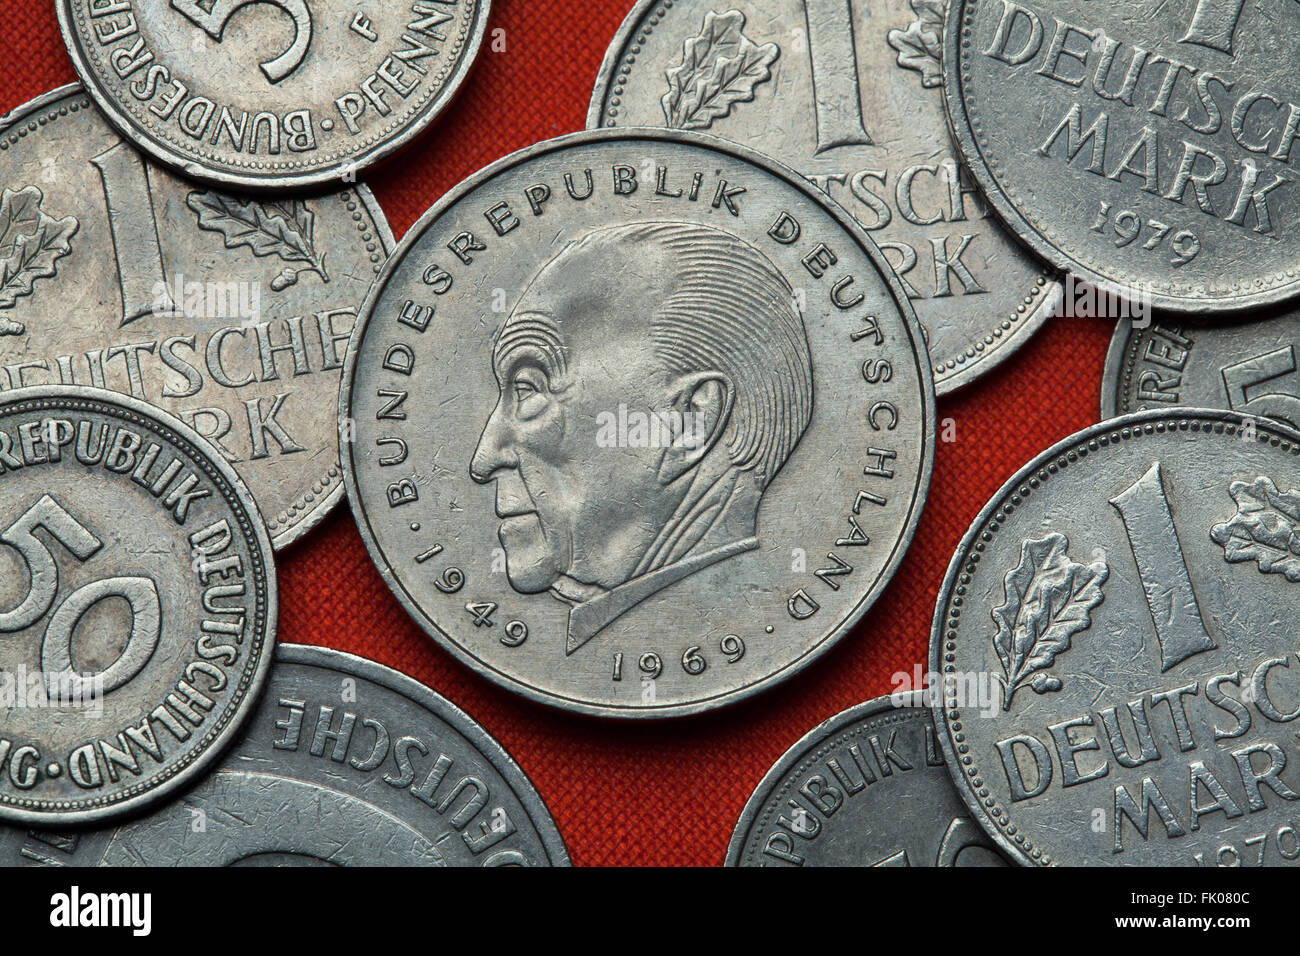 Adenauer Des 20 Jahrhunderts Stockfotos Adenauer Des 20